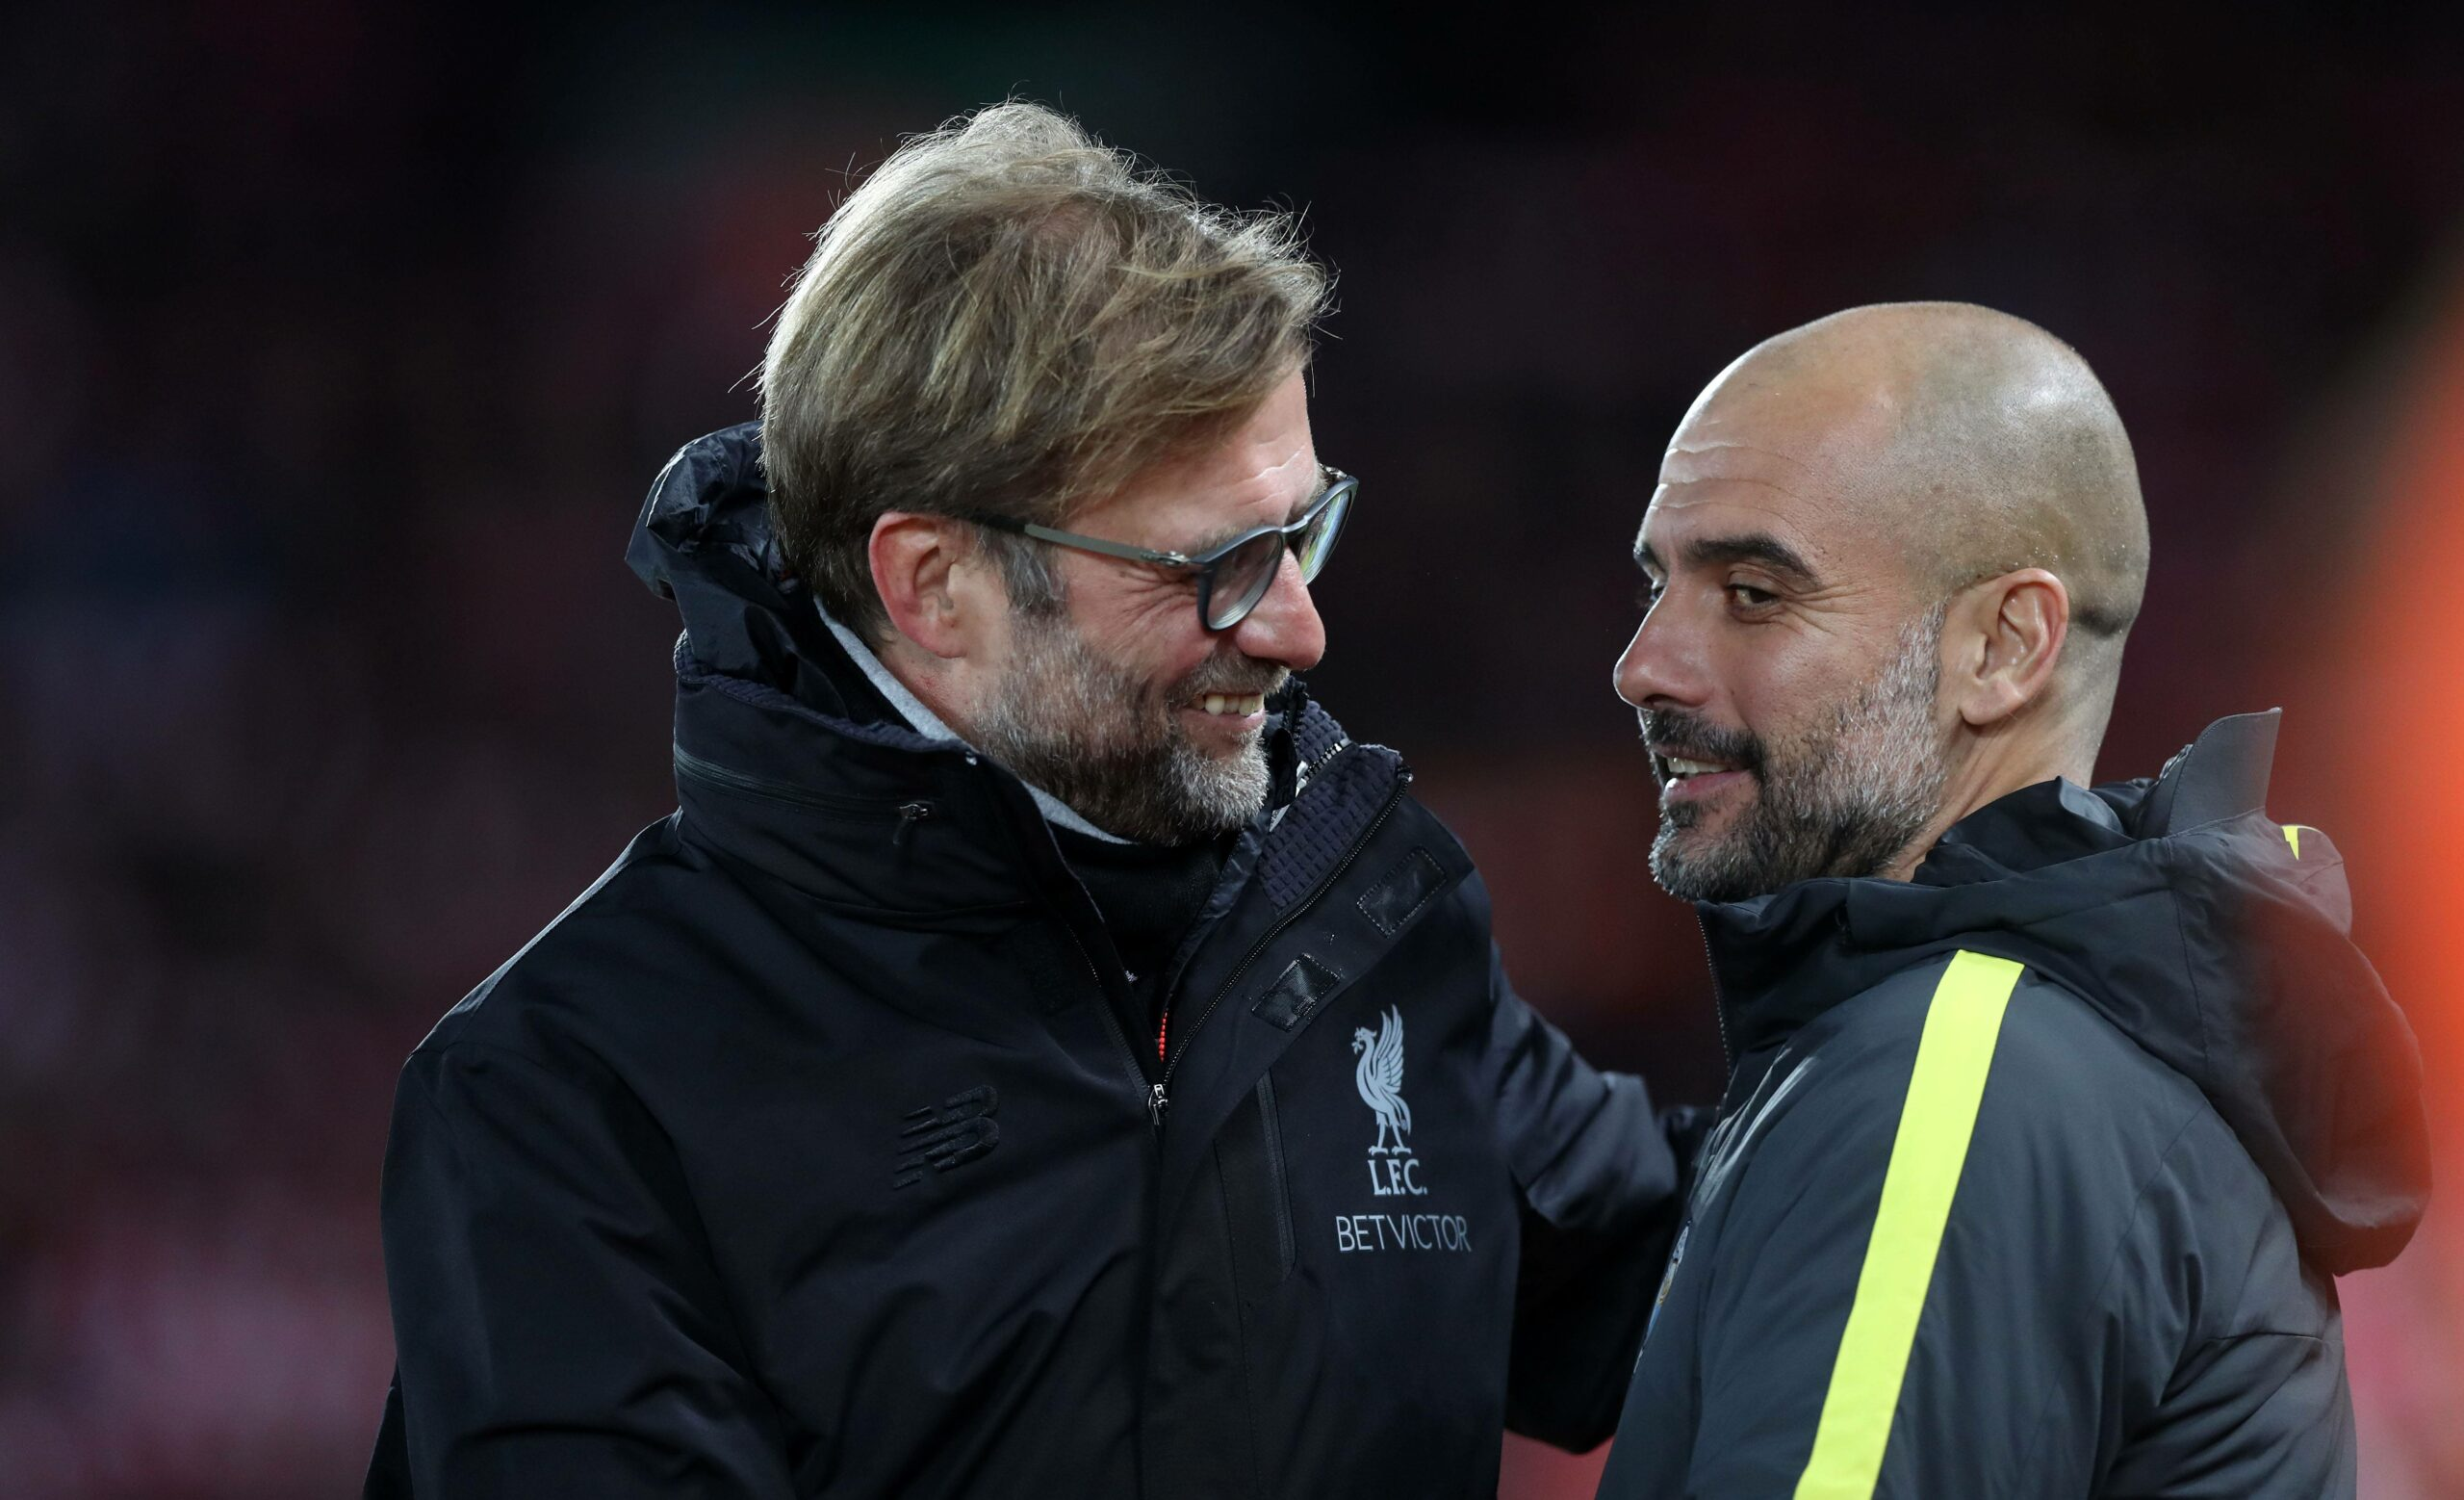 Klopp (Liverpool), Guardiola (Manchester City) mit Shake-Hands